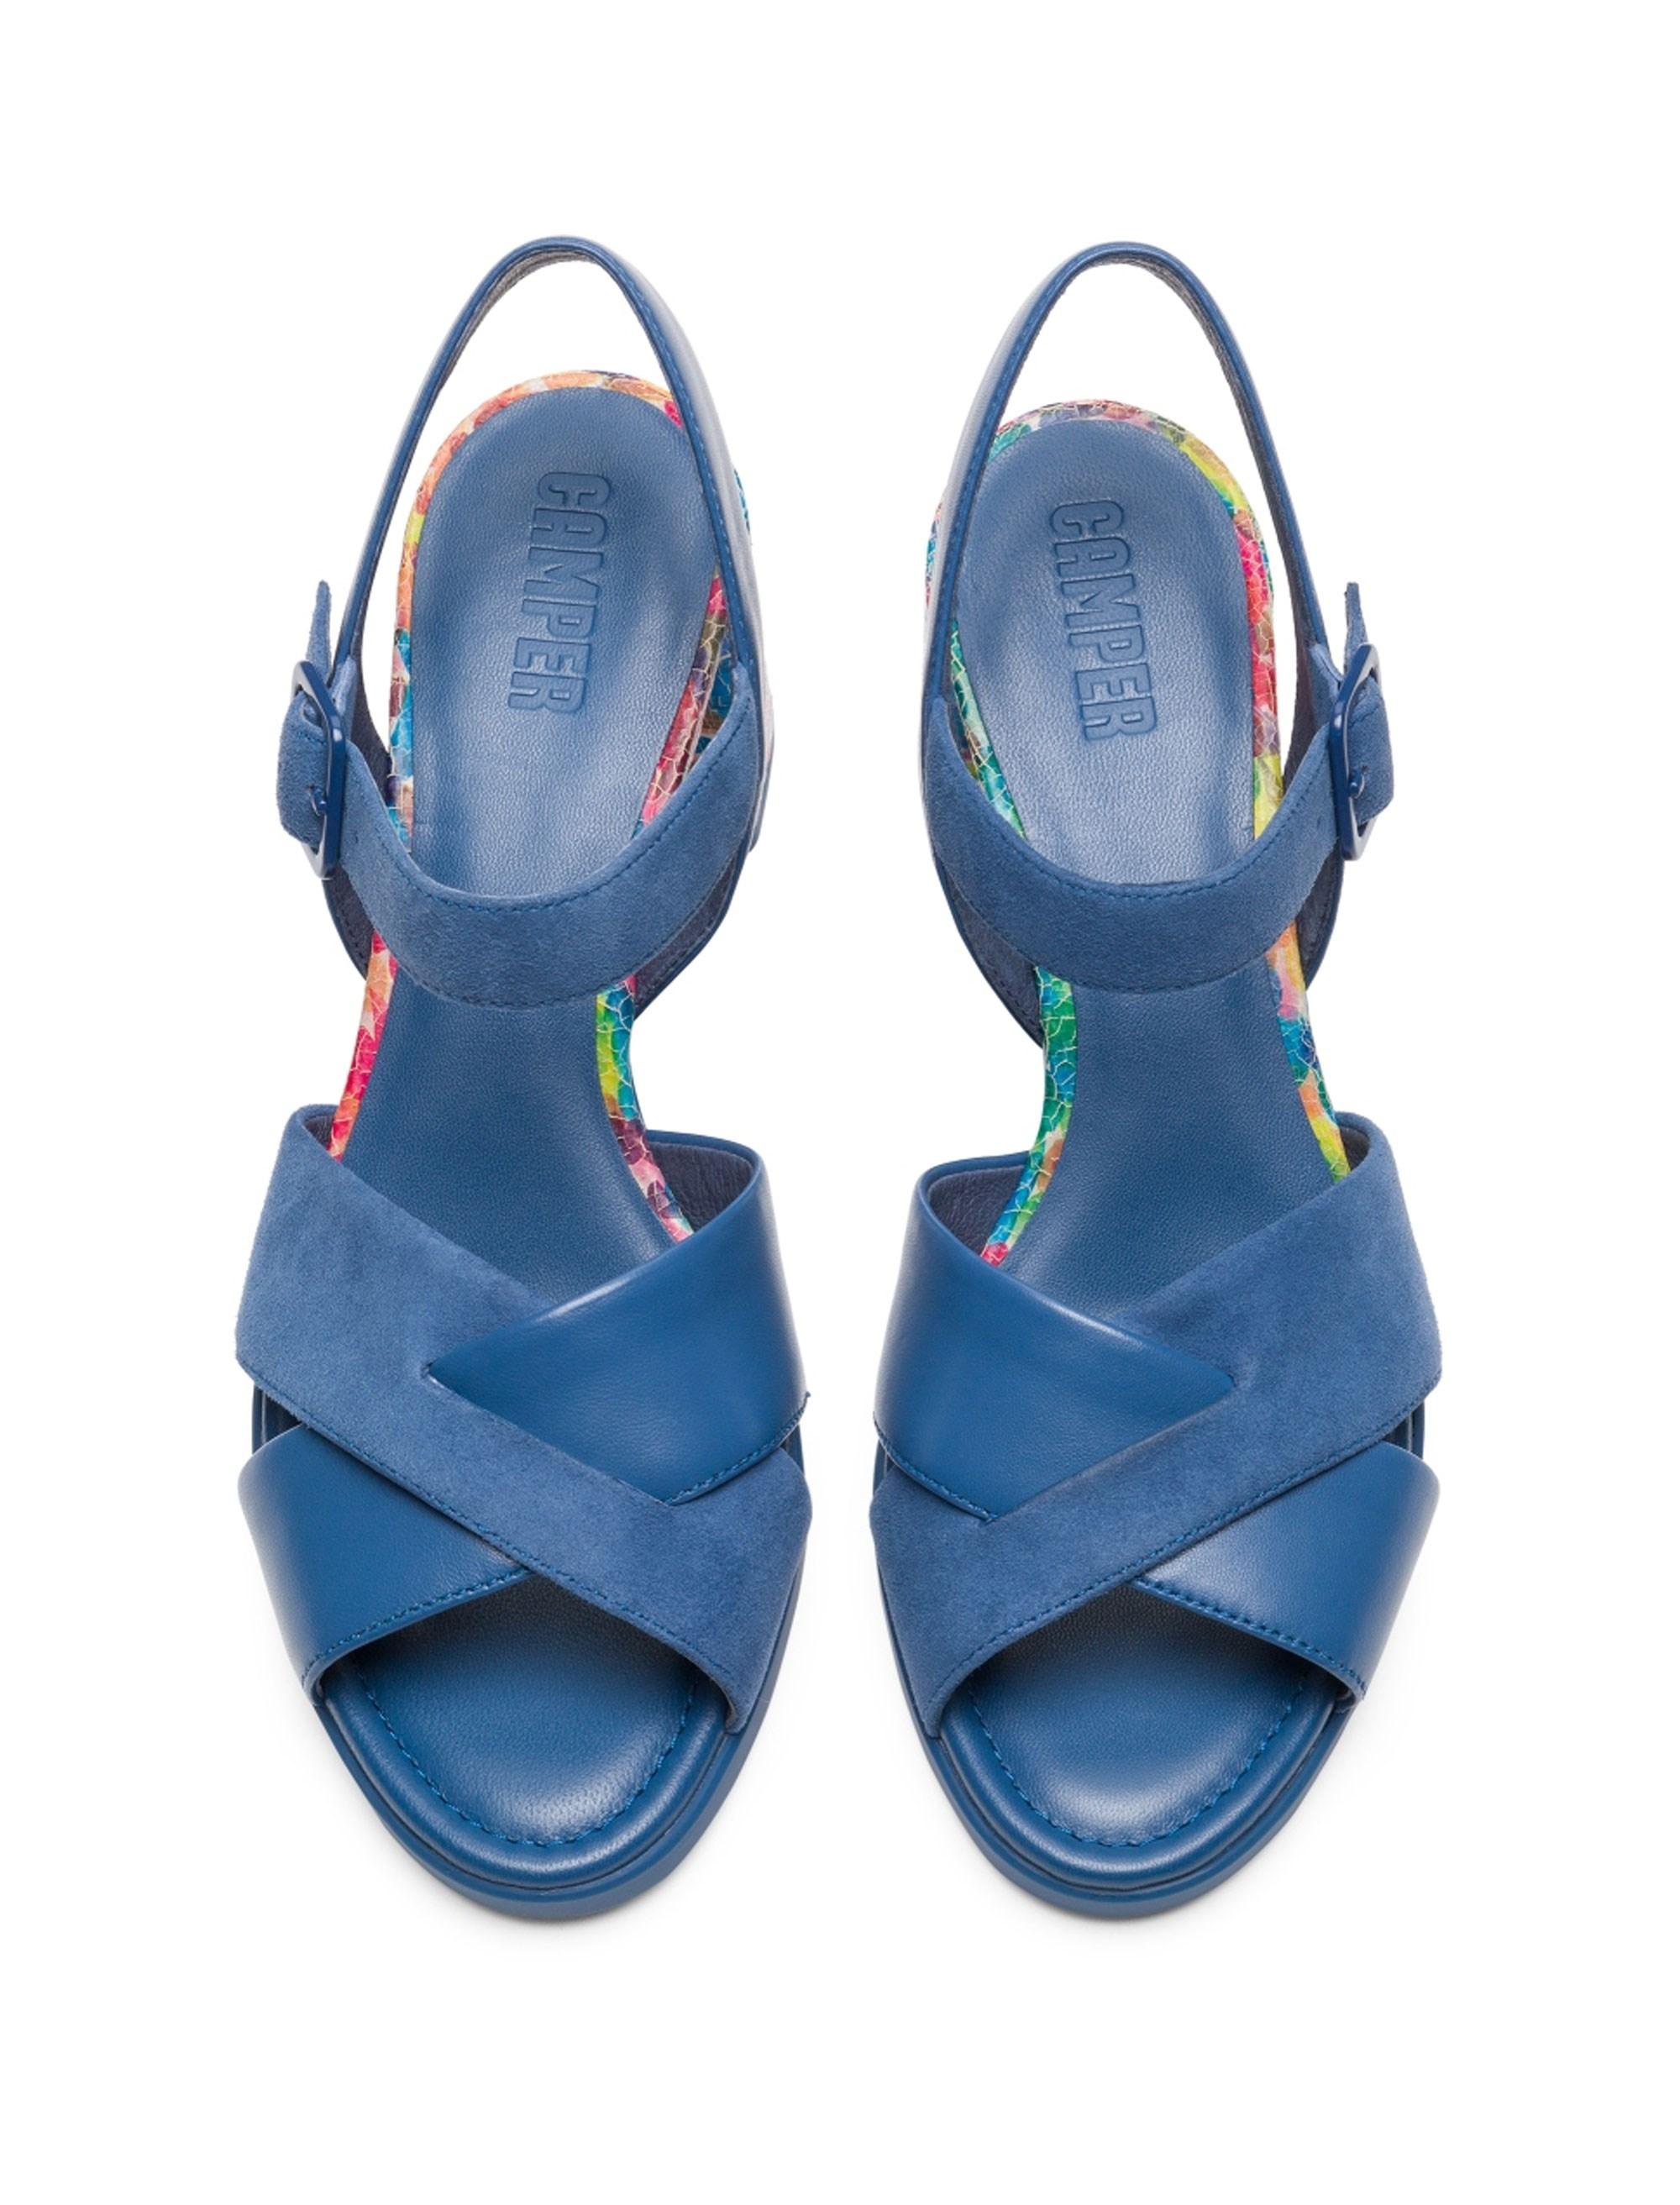 کفش پاشنه بلند چرم زنانه Kara - آبي - 2